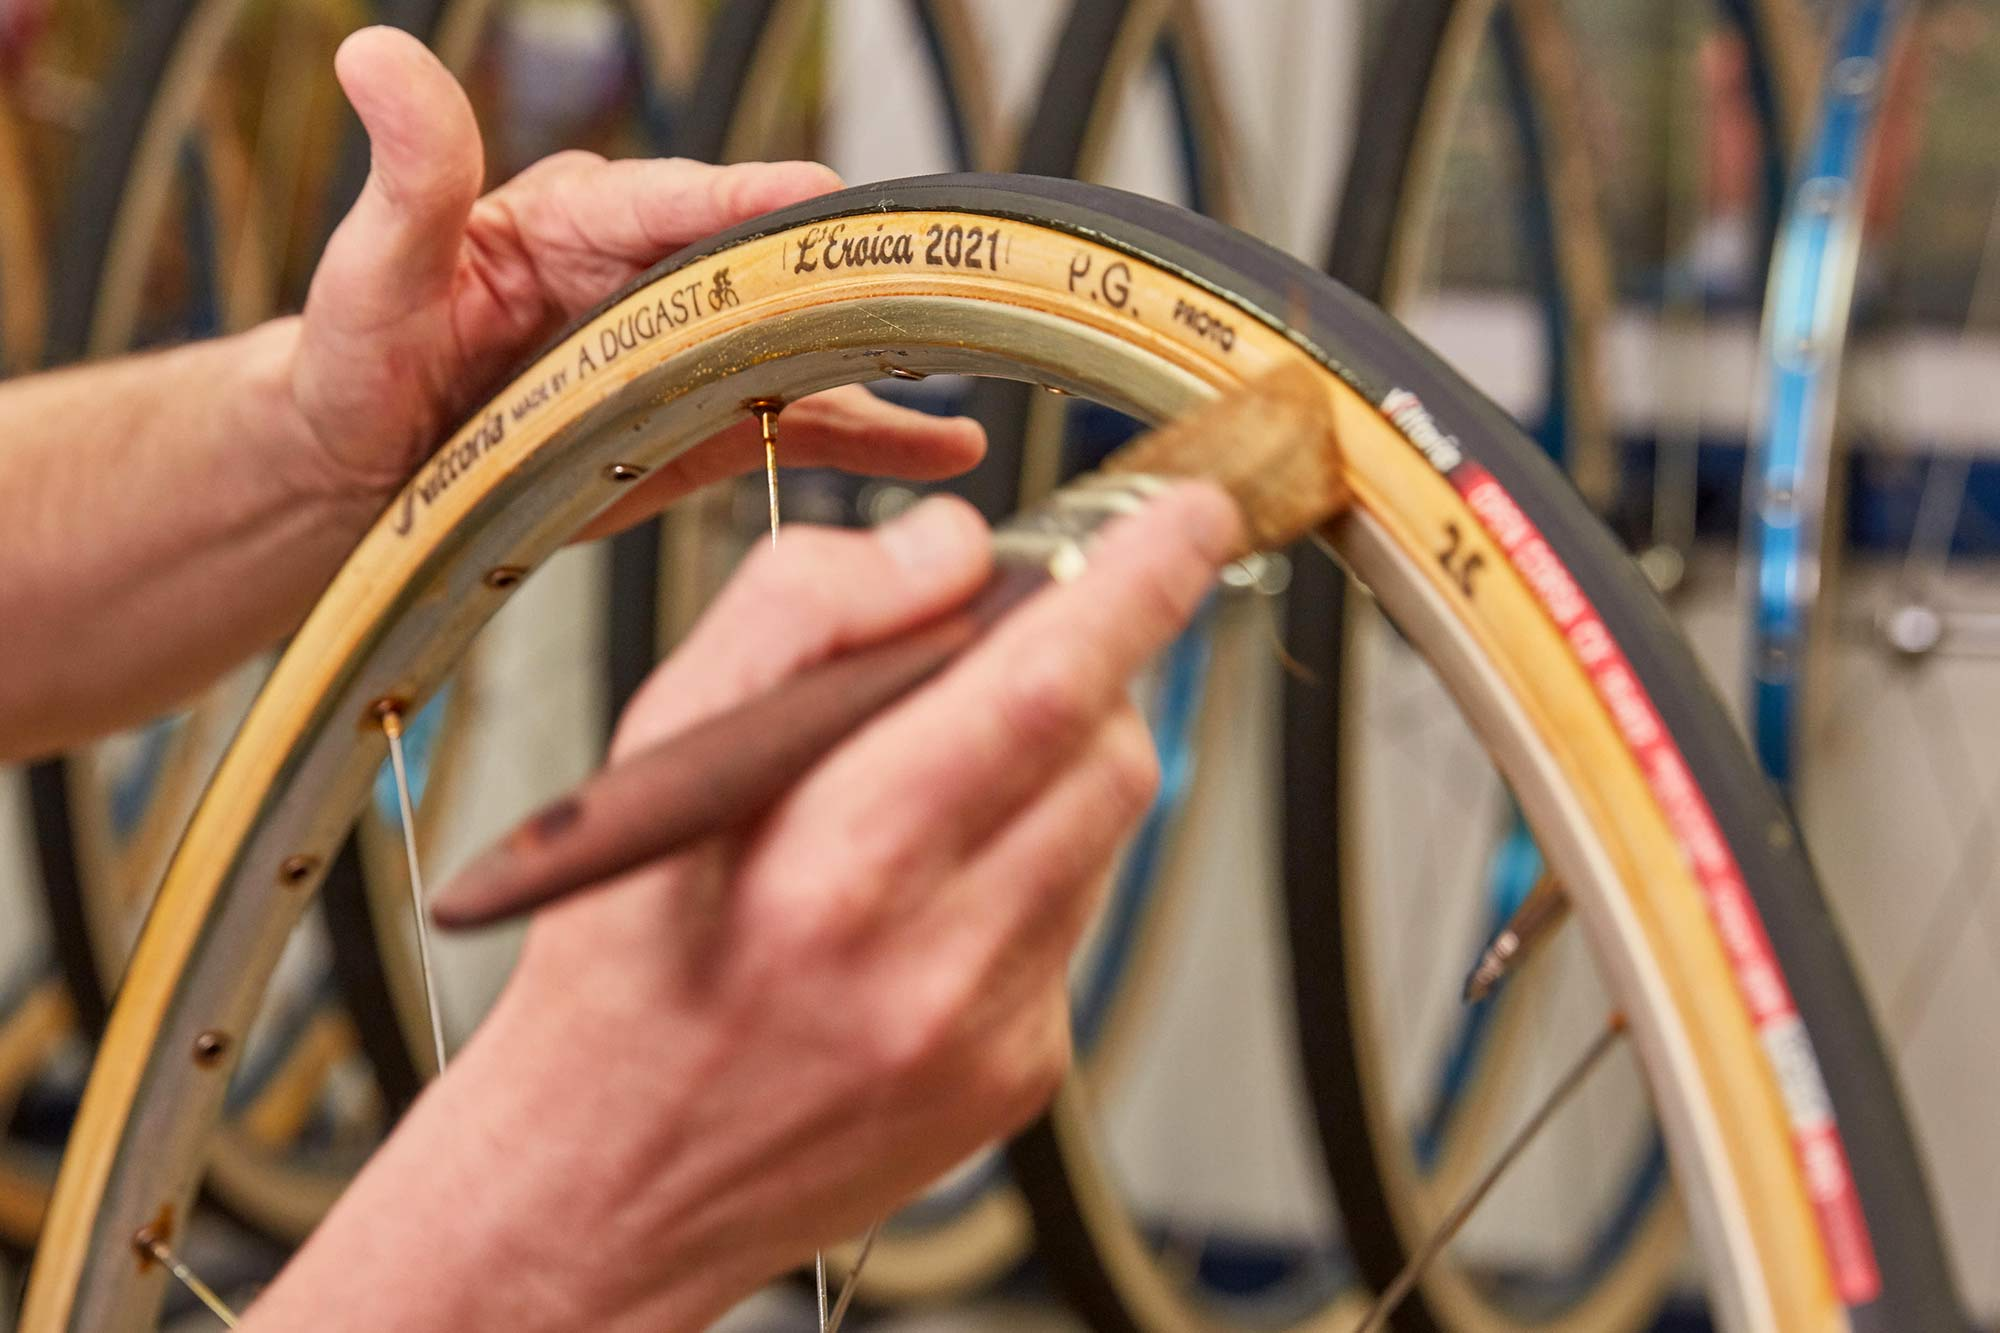 Vittoria made by A Dugast L Eroica limited edition 25mm retro vintage tubular road bike tires,Dugast workshop